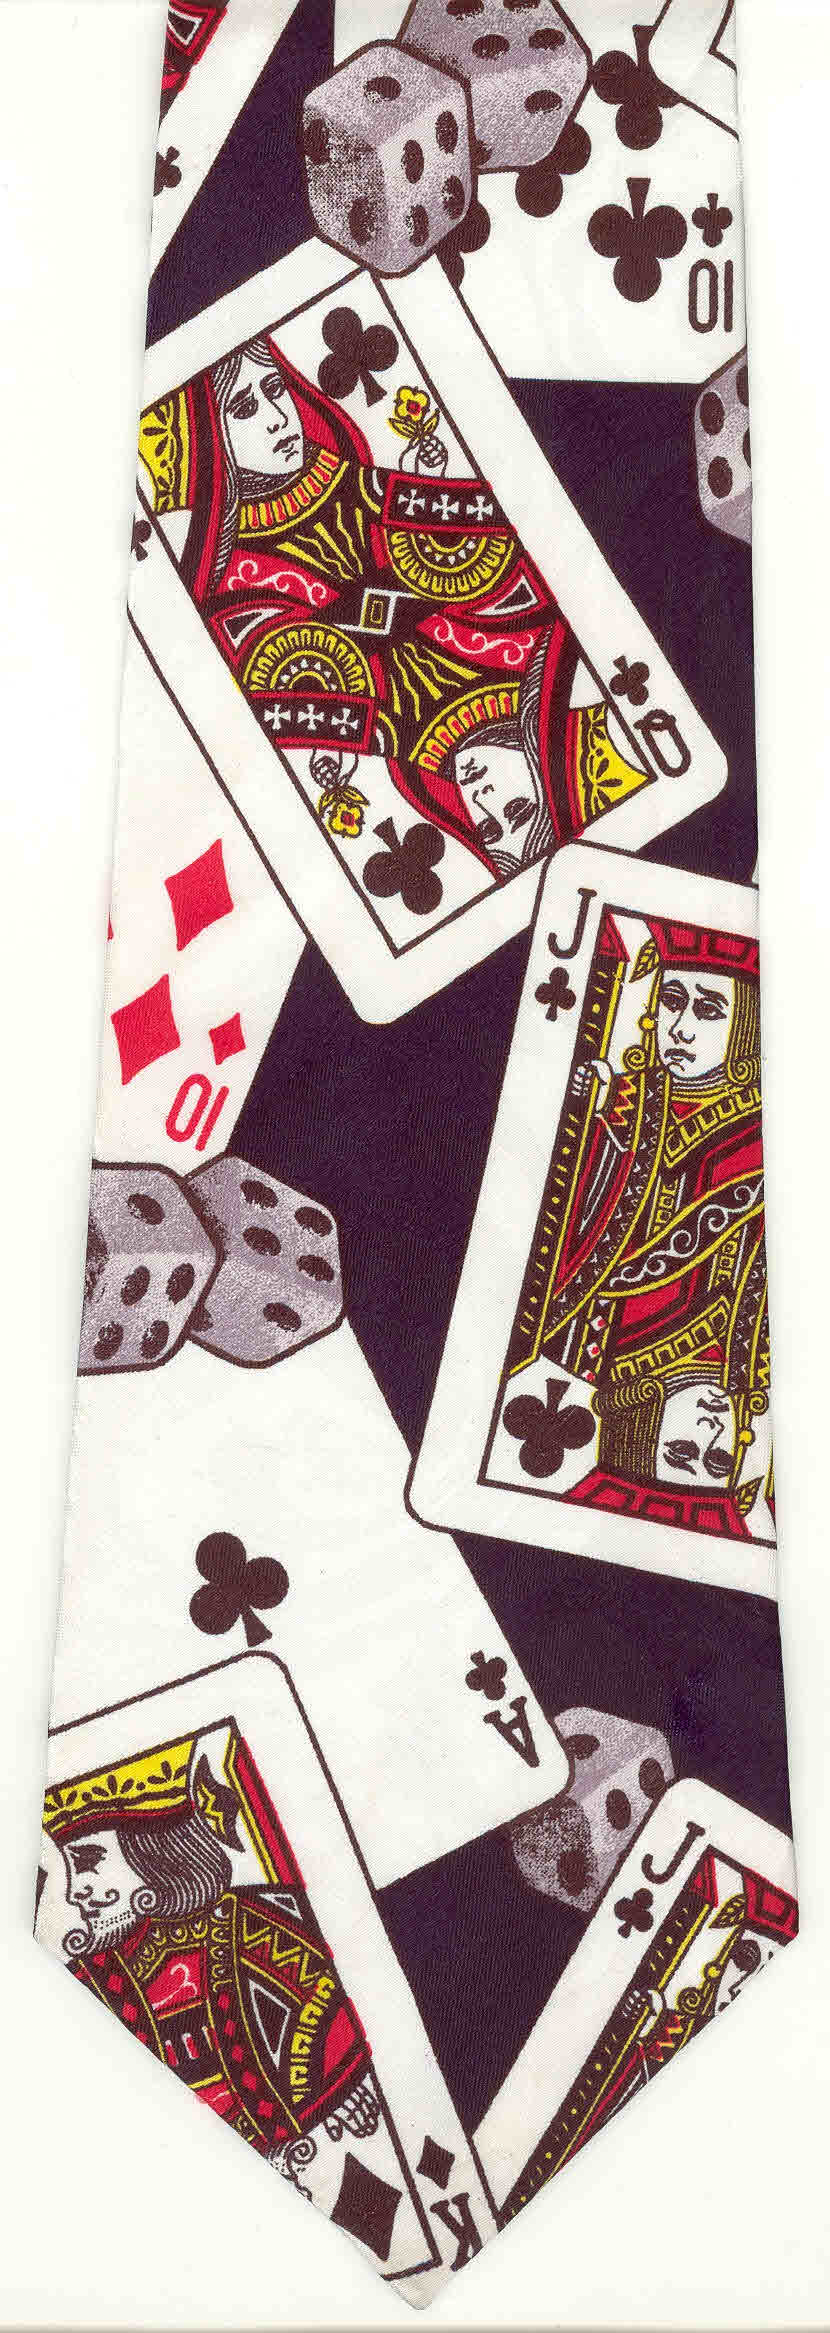 015 Cards & Dice.jpg